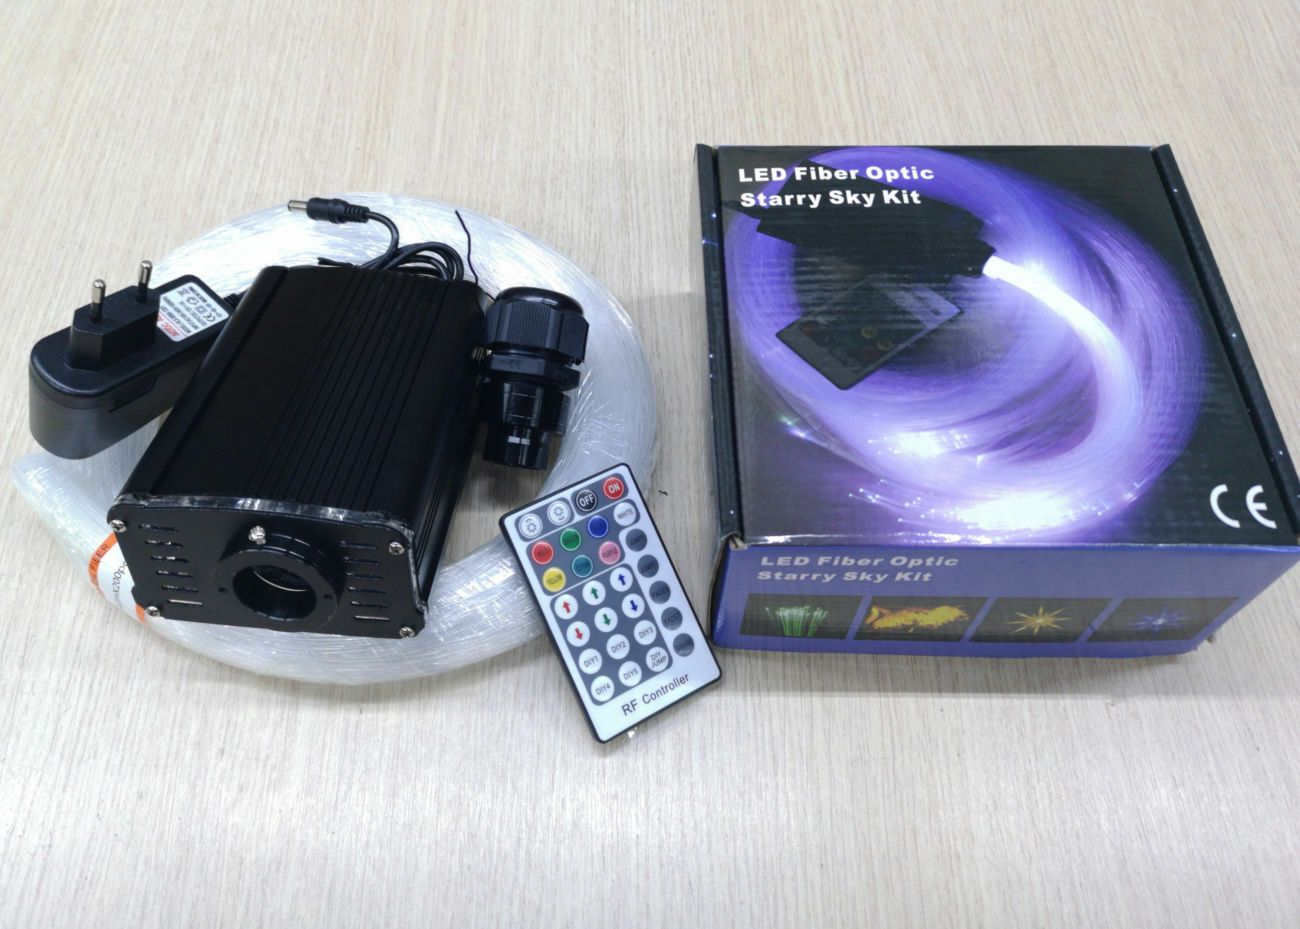 KIT FIBRA OTTICA CIELO STELLATO RGB E blanco LED 16W -200 PUNTI LUCE DA 1MM X 2MT